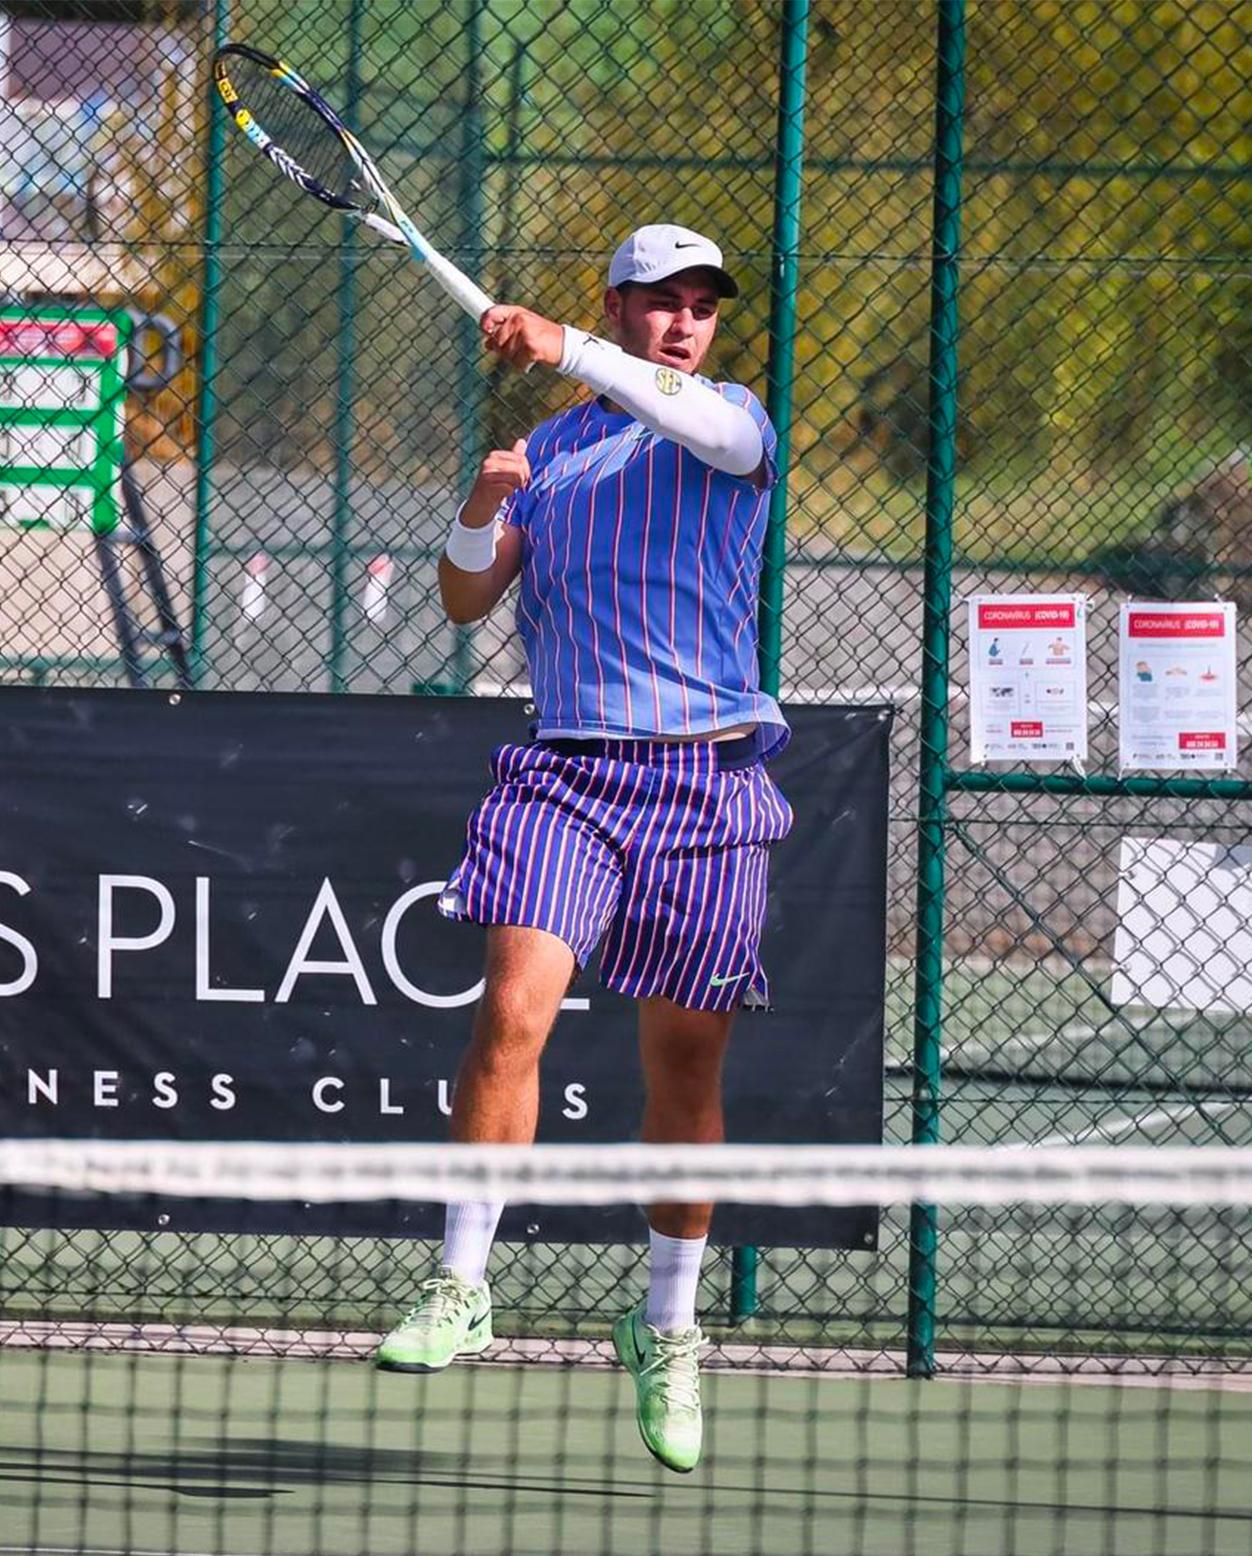 https://www.team-bms-tennis.fr/wp-content/uploads/2020/10/ValentinDeCarvalho.jpg